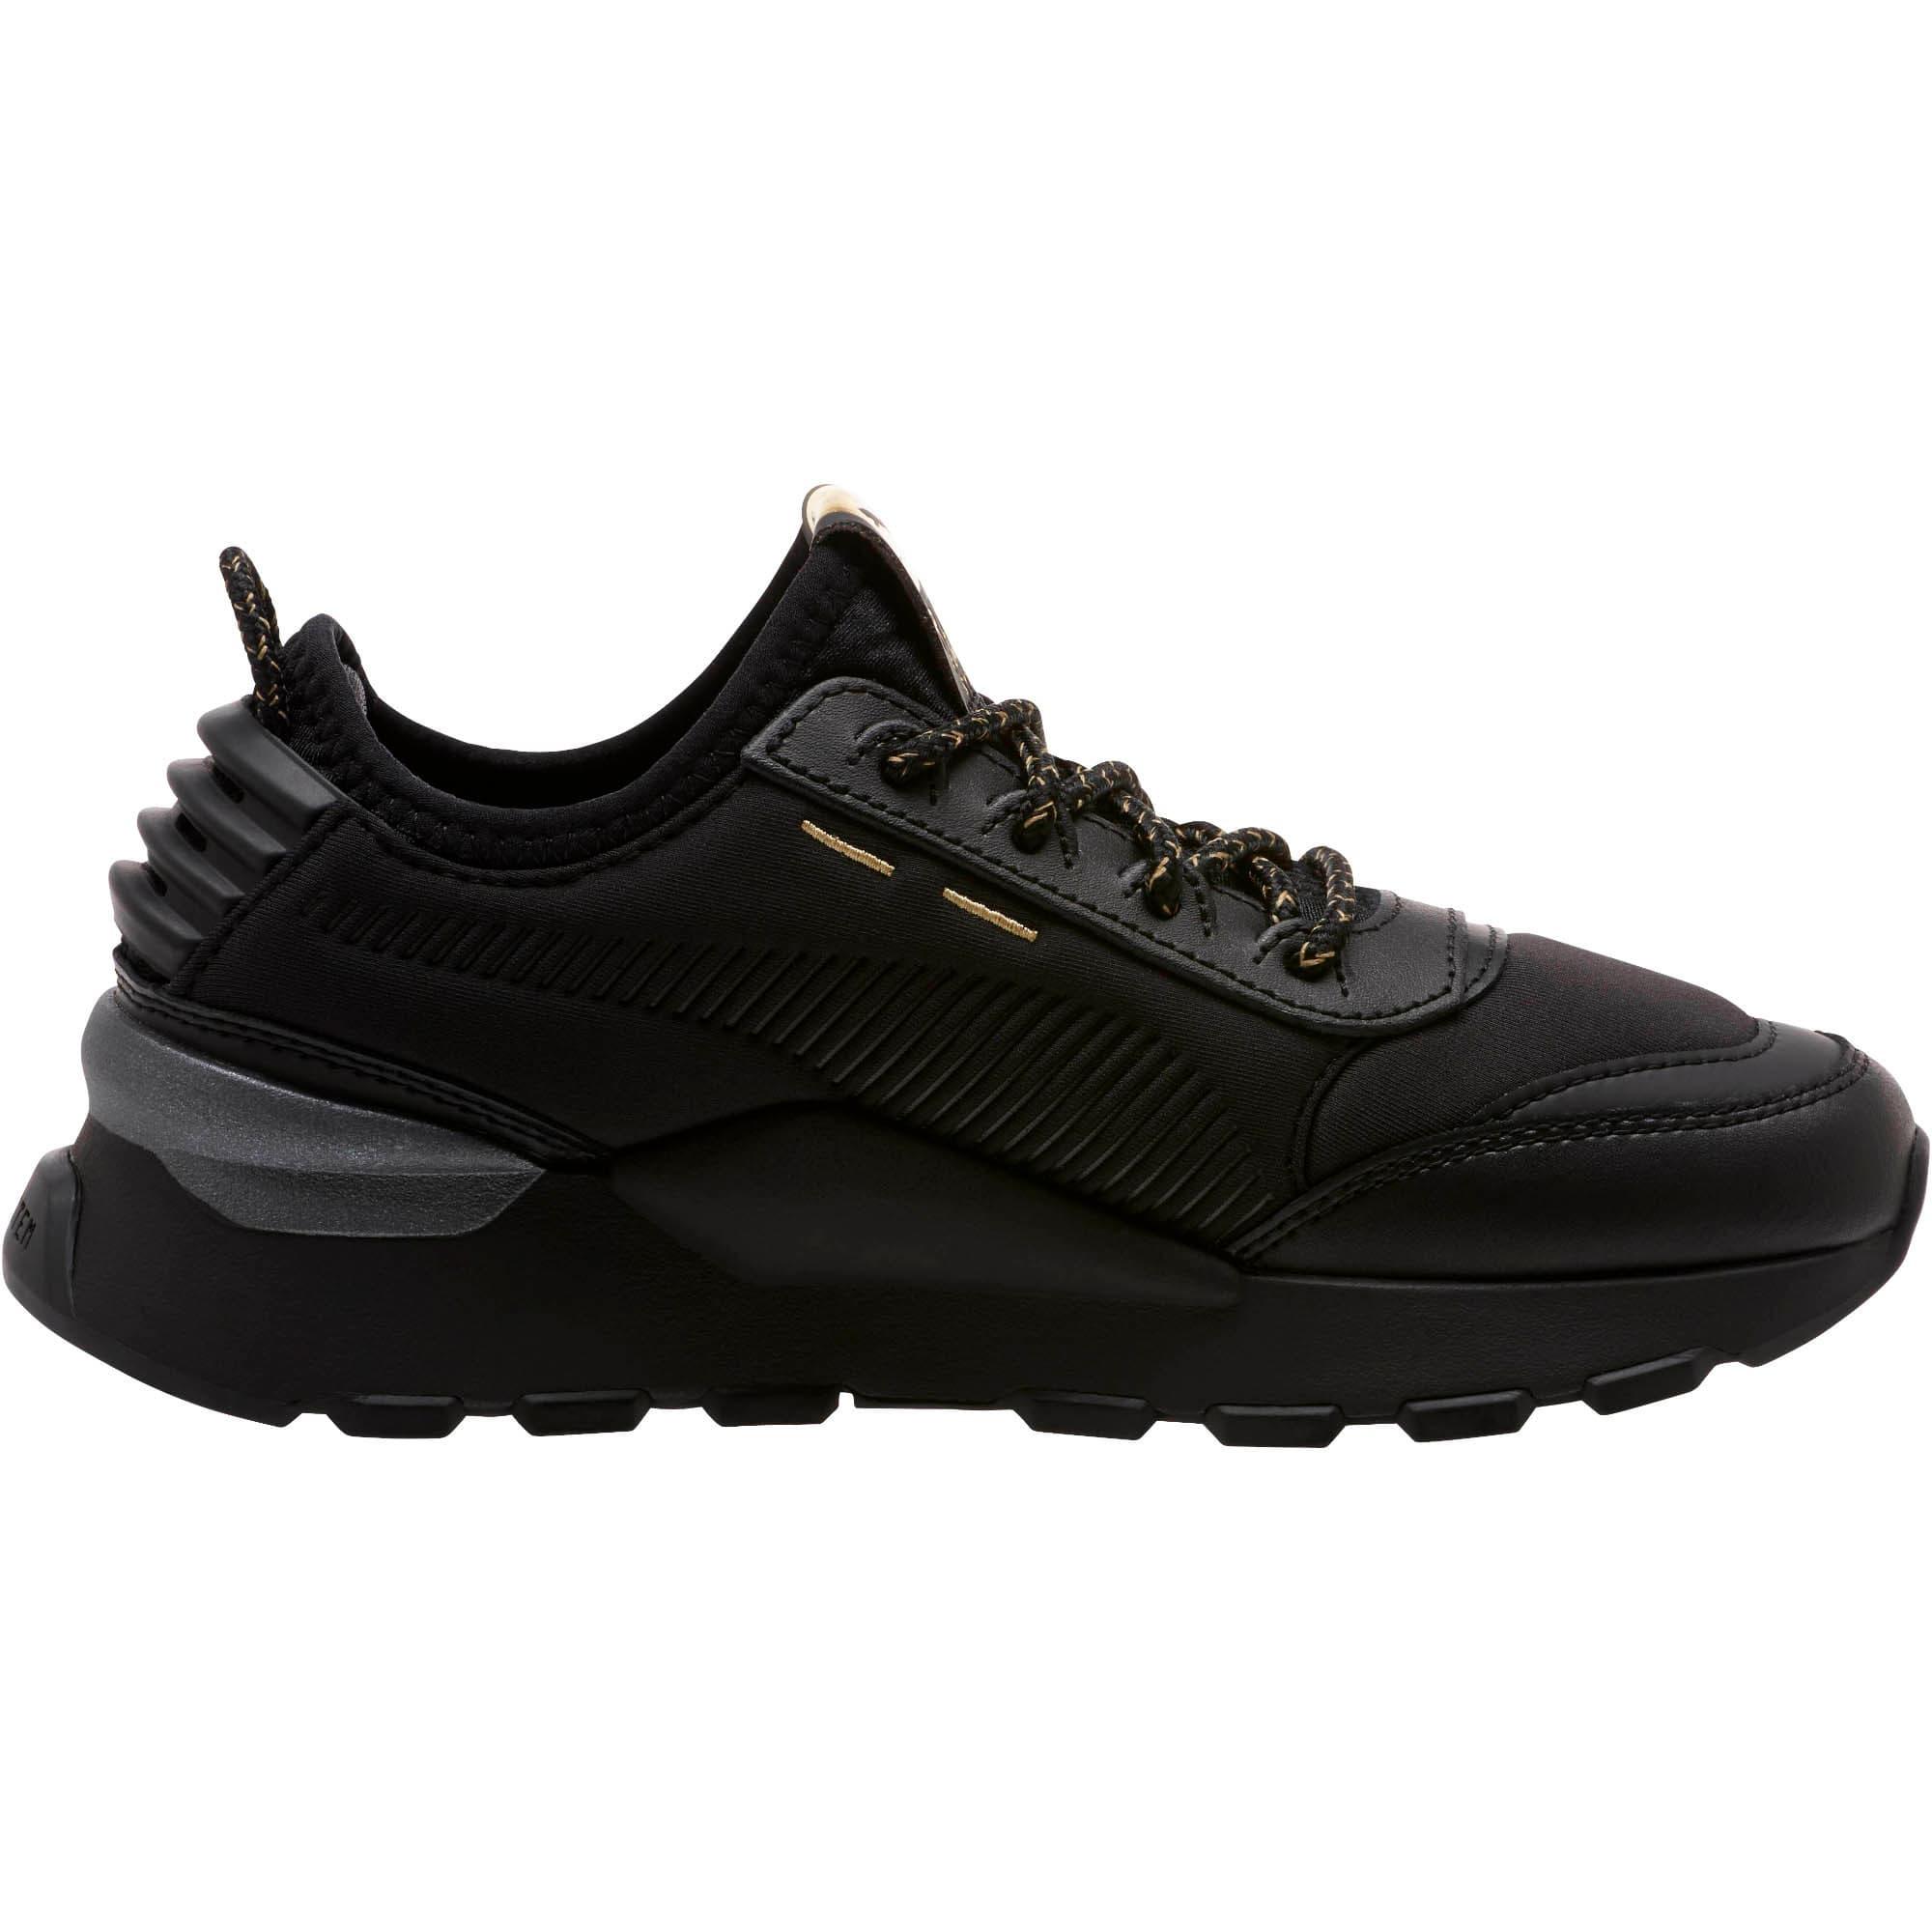 Thumbnail 4 of RS-0 Trophy Sneakers JR, Puma Black-Puma Black, medium